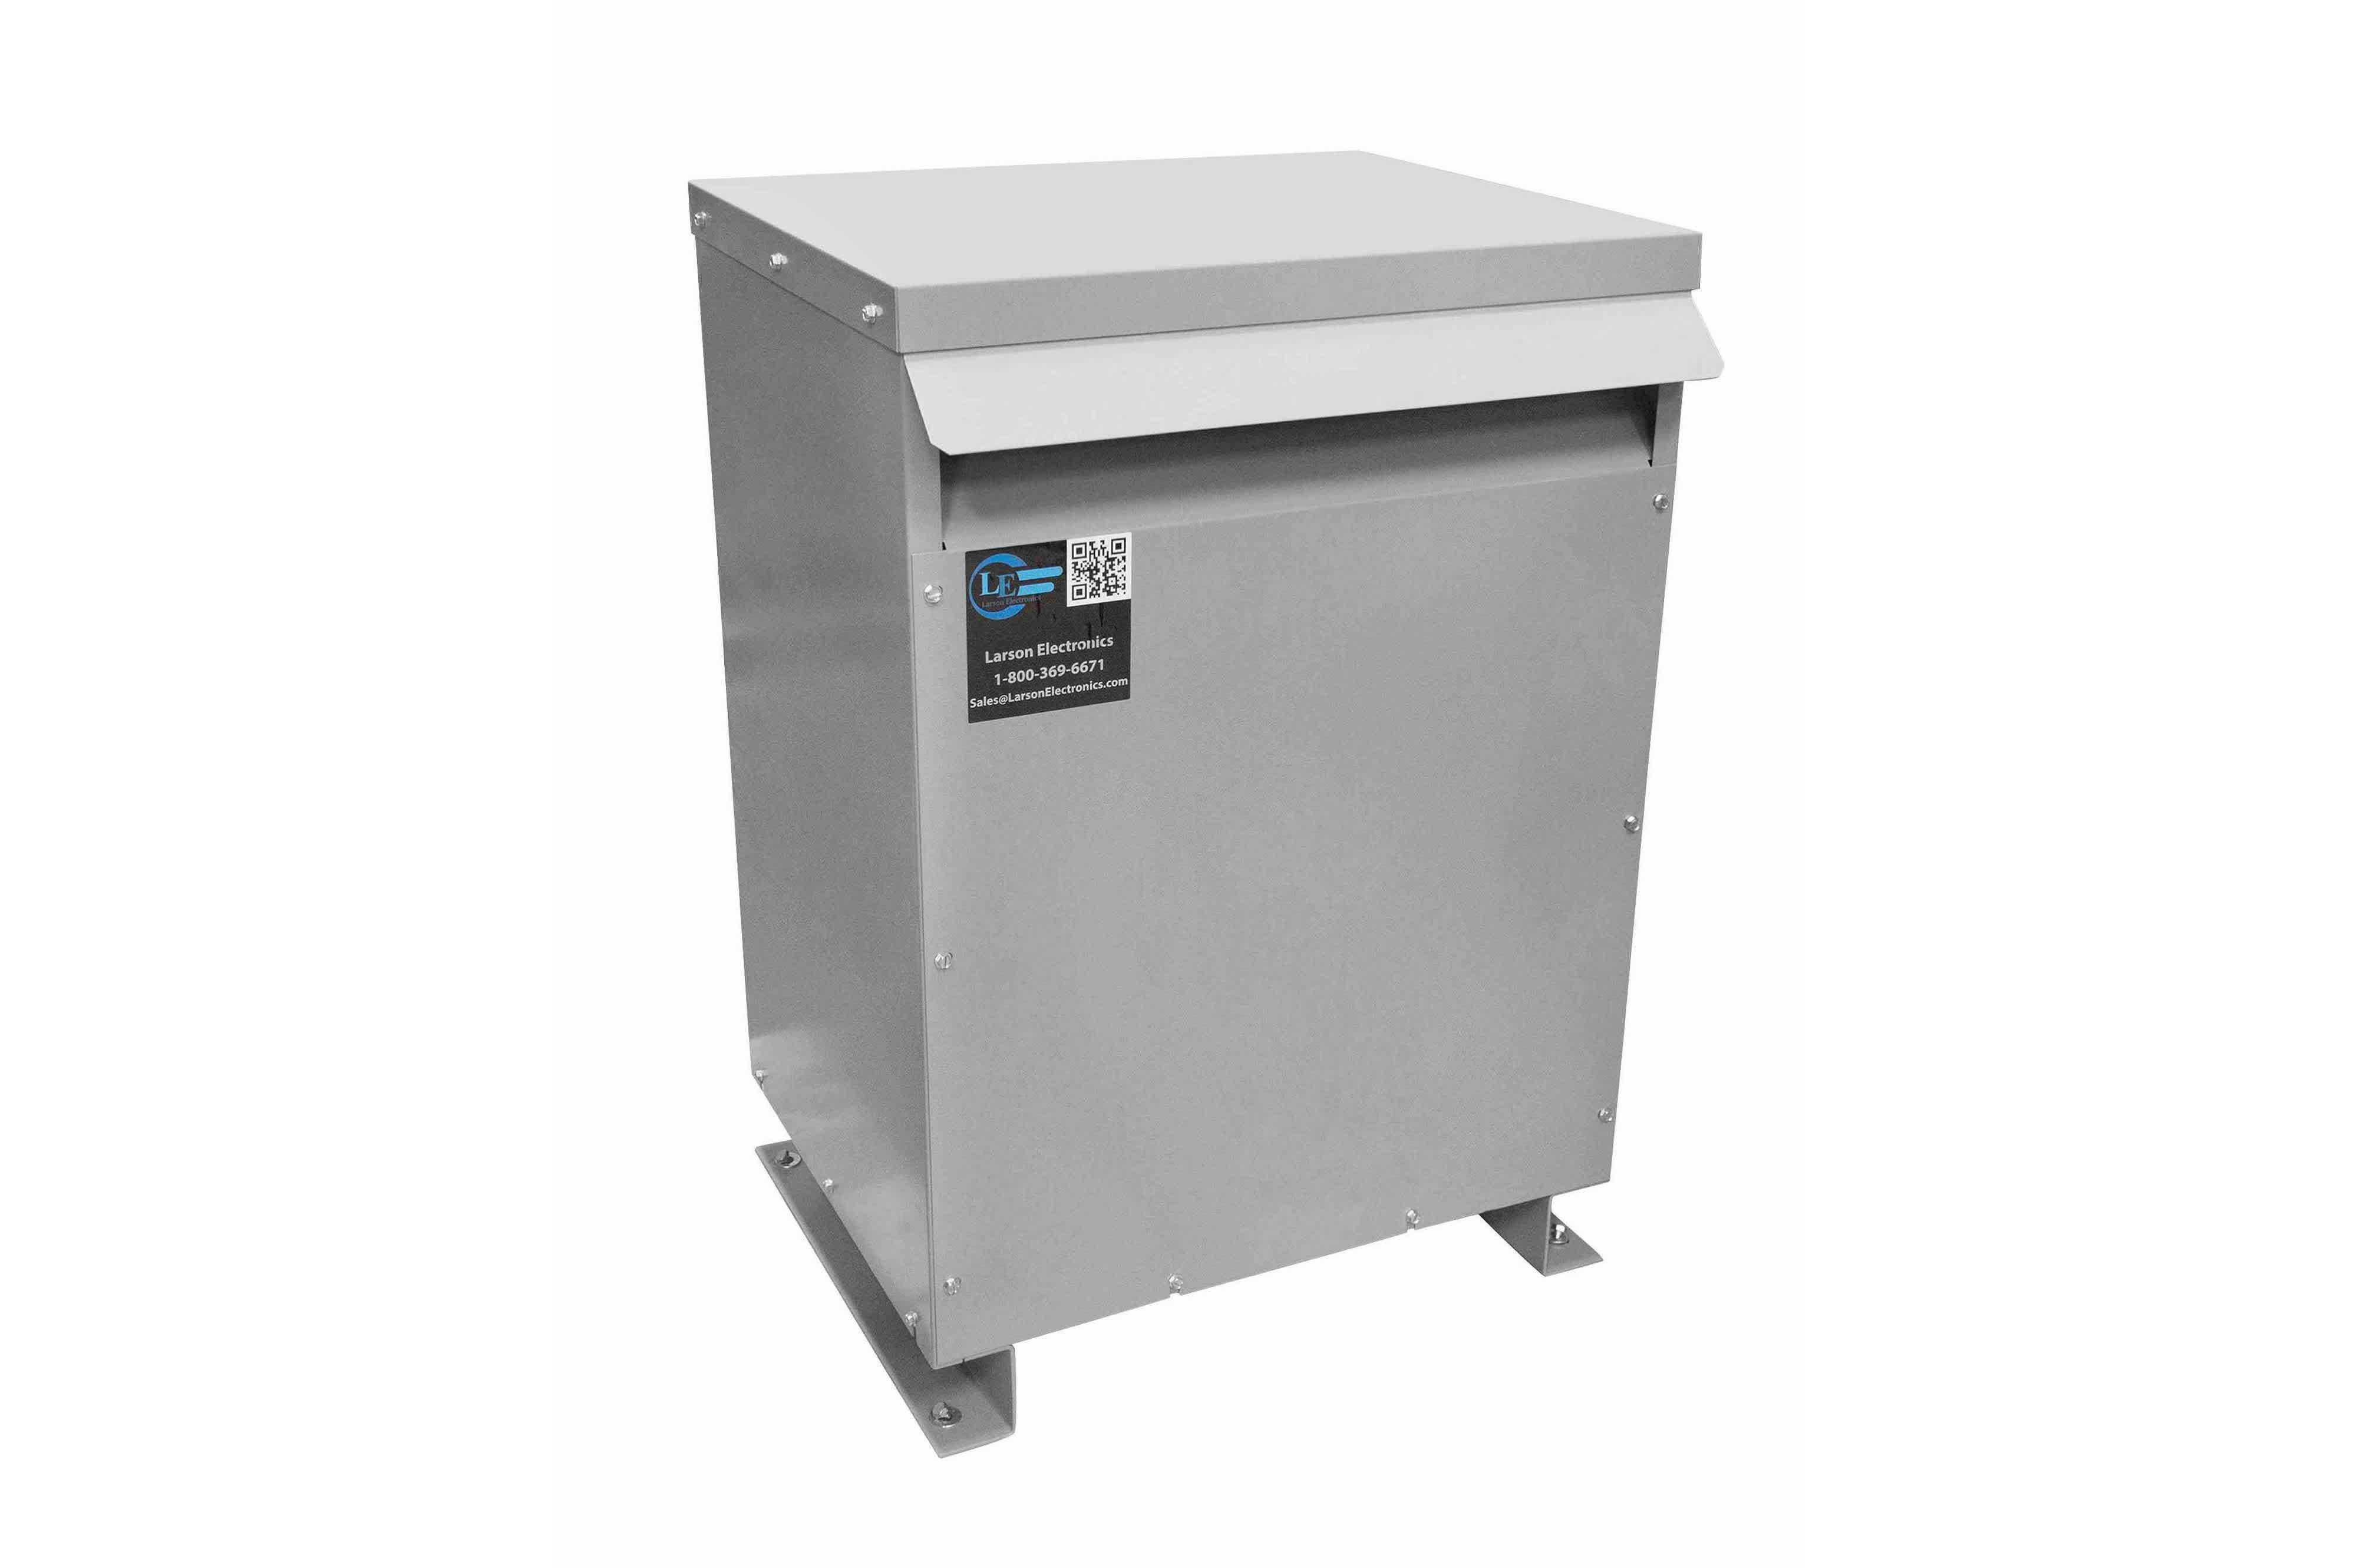 10 kVA 3PH Isolation Transformer, 575V Wye Primary, 380V Delta Secondary, N3R, Ventilated, 60 Hz